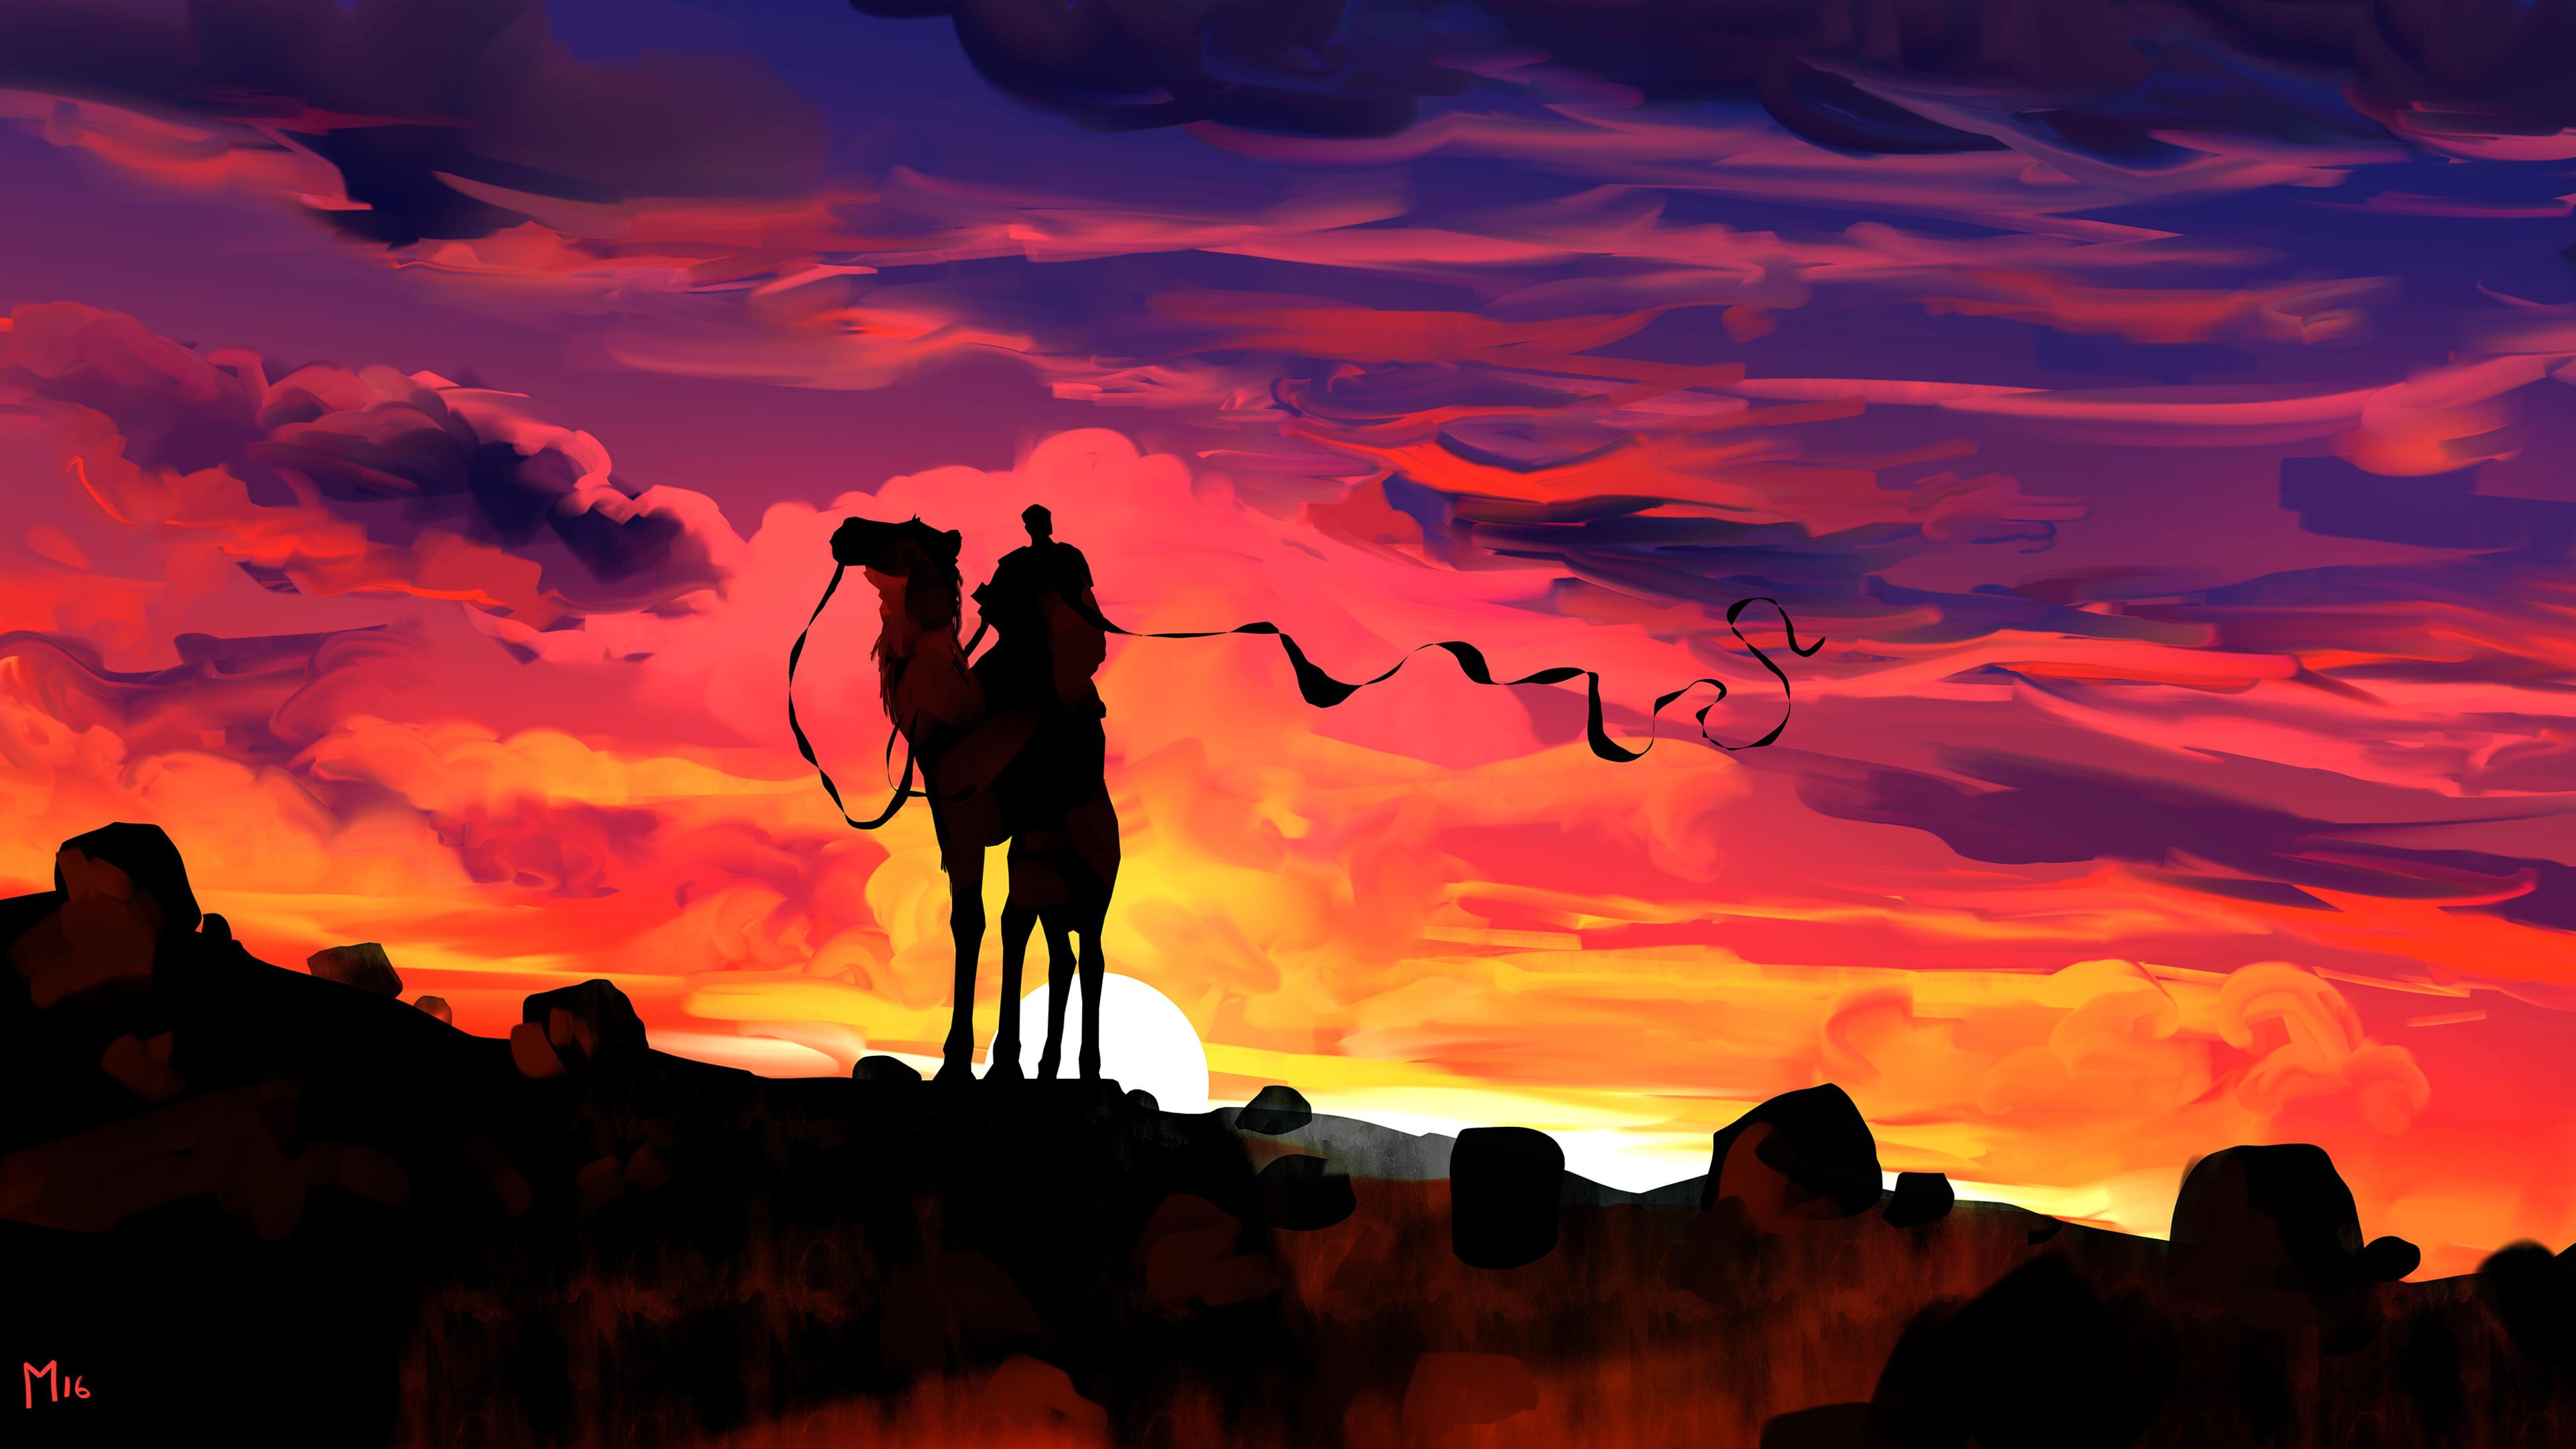 clouds dawn camel rider fantasy illustration 4k 1541970907 - Clouds Dawn Camel Rider Fantasy Illustration 4k - sunset wallpapers, illustration wallpapers, hd-wallpapers, digital art wallpapers, camel wallpapers, behance wallpapers, artwork wallpapers, artist wallpapers, 4k-wallpapers